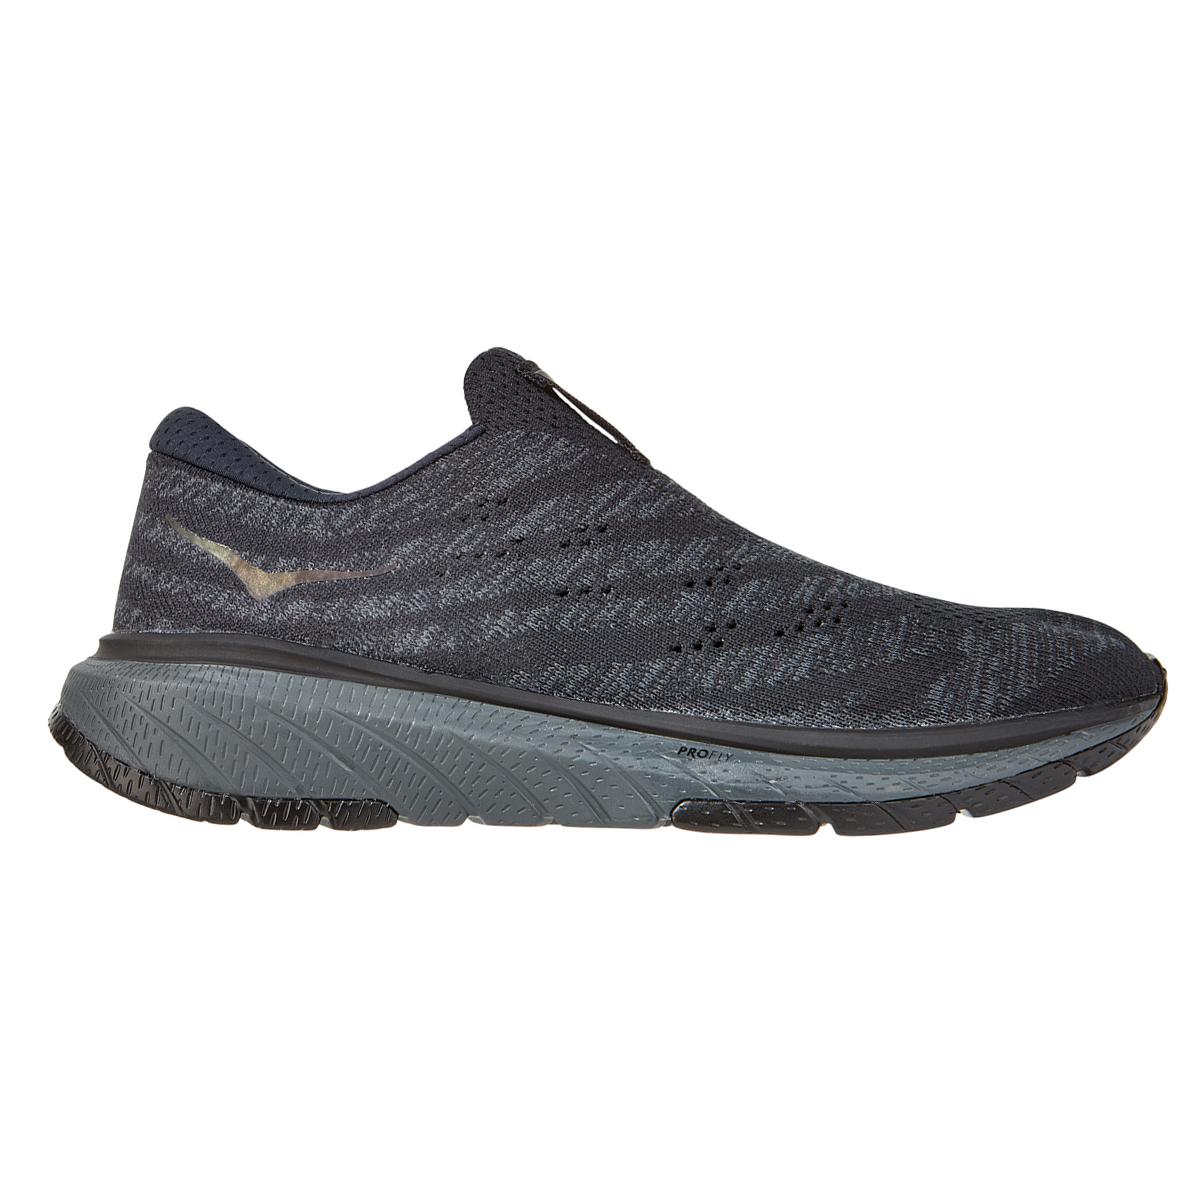 Women's Hoka One One Cavu 3 Slip Running Shoe - Color: Black/Dark Shadow - Size: 5 - Width: Regular, Black/Dark Shadow, large, image 1